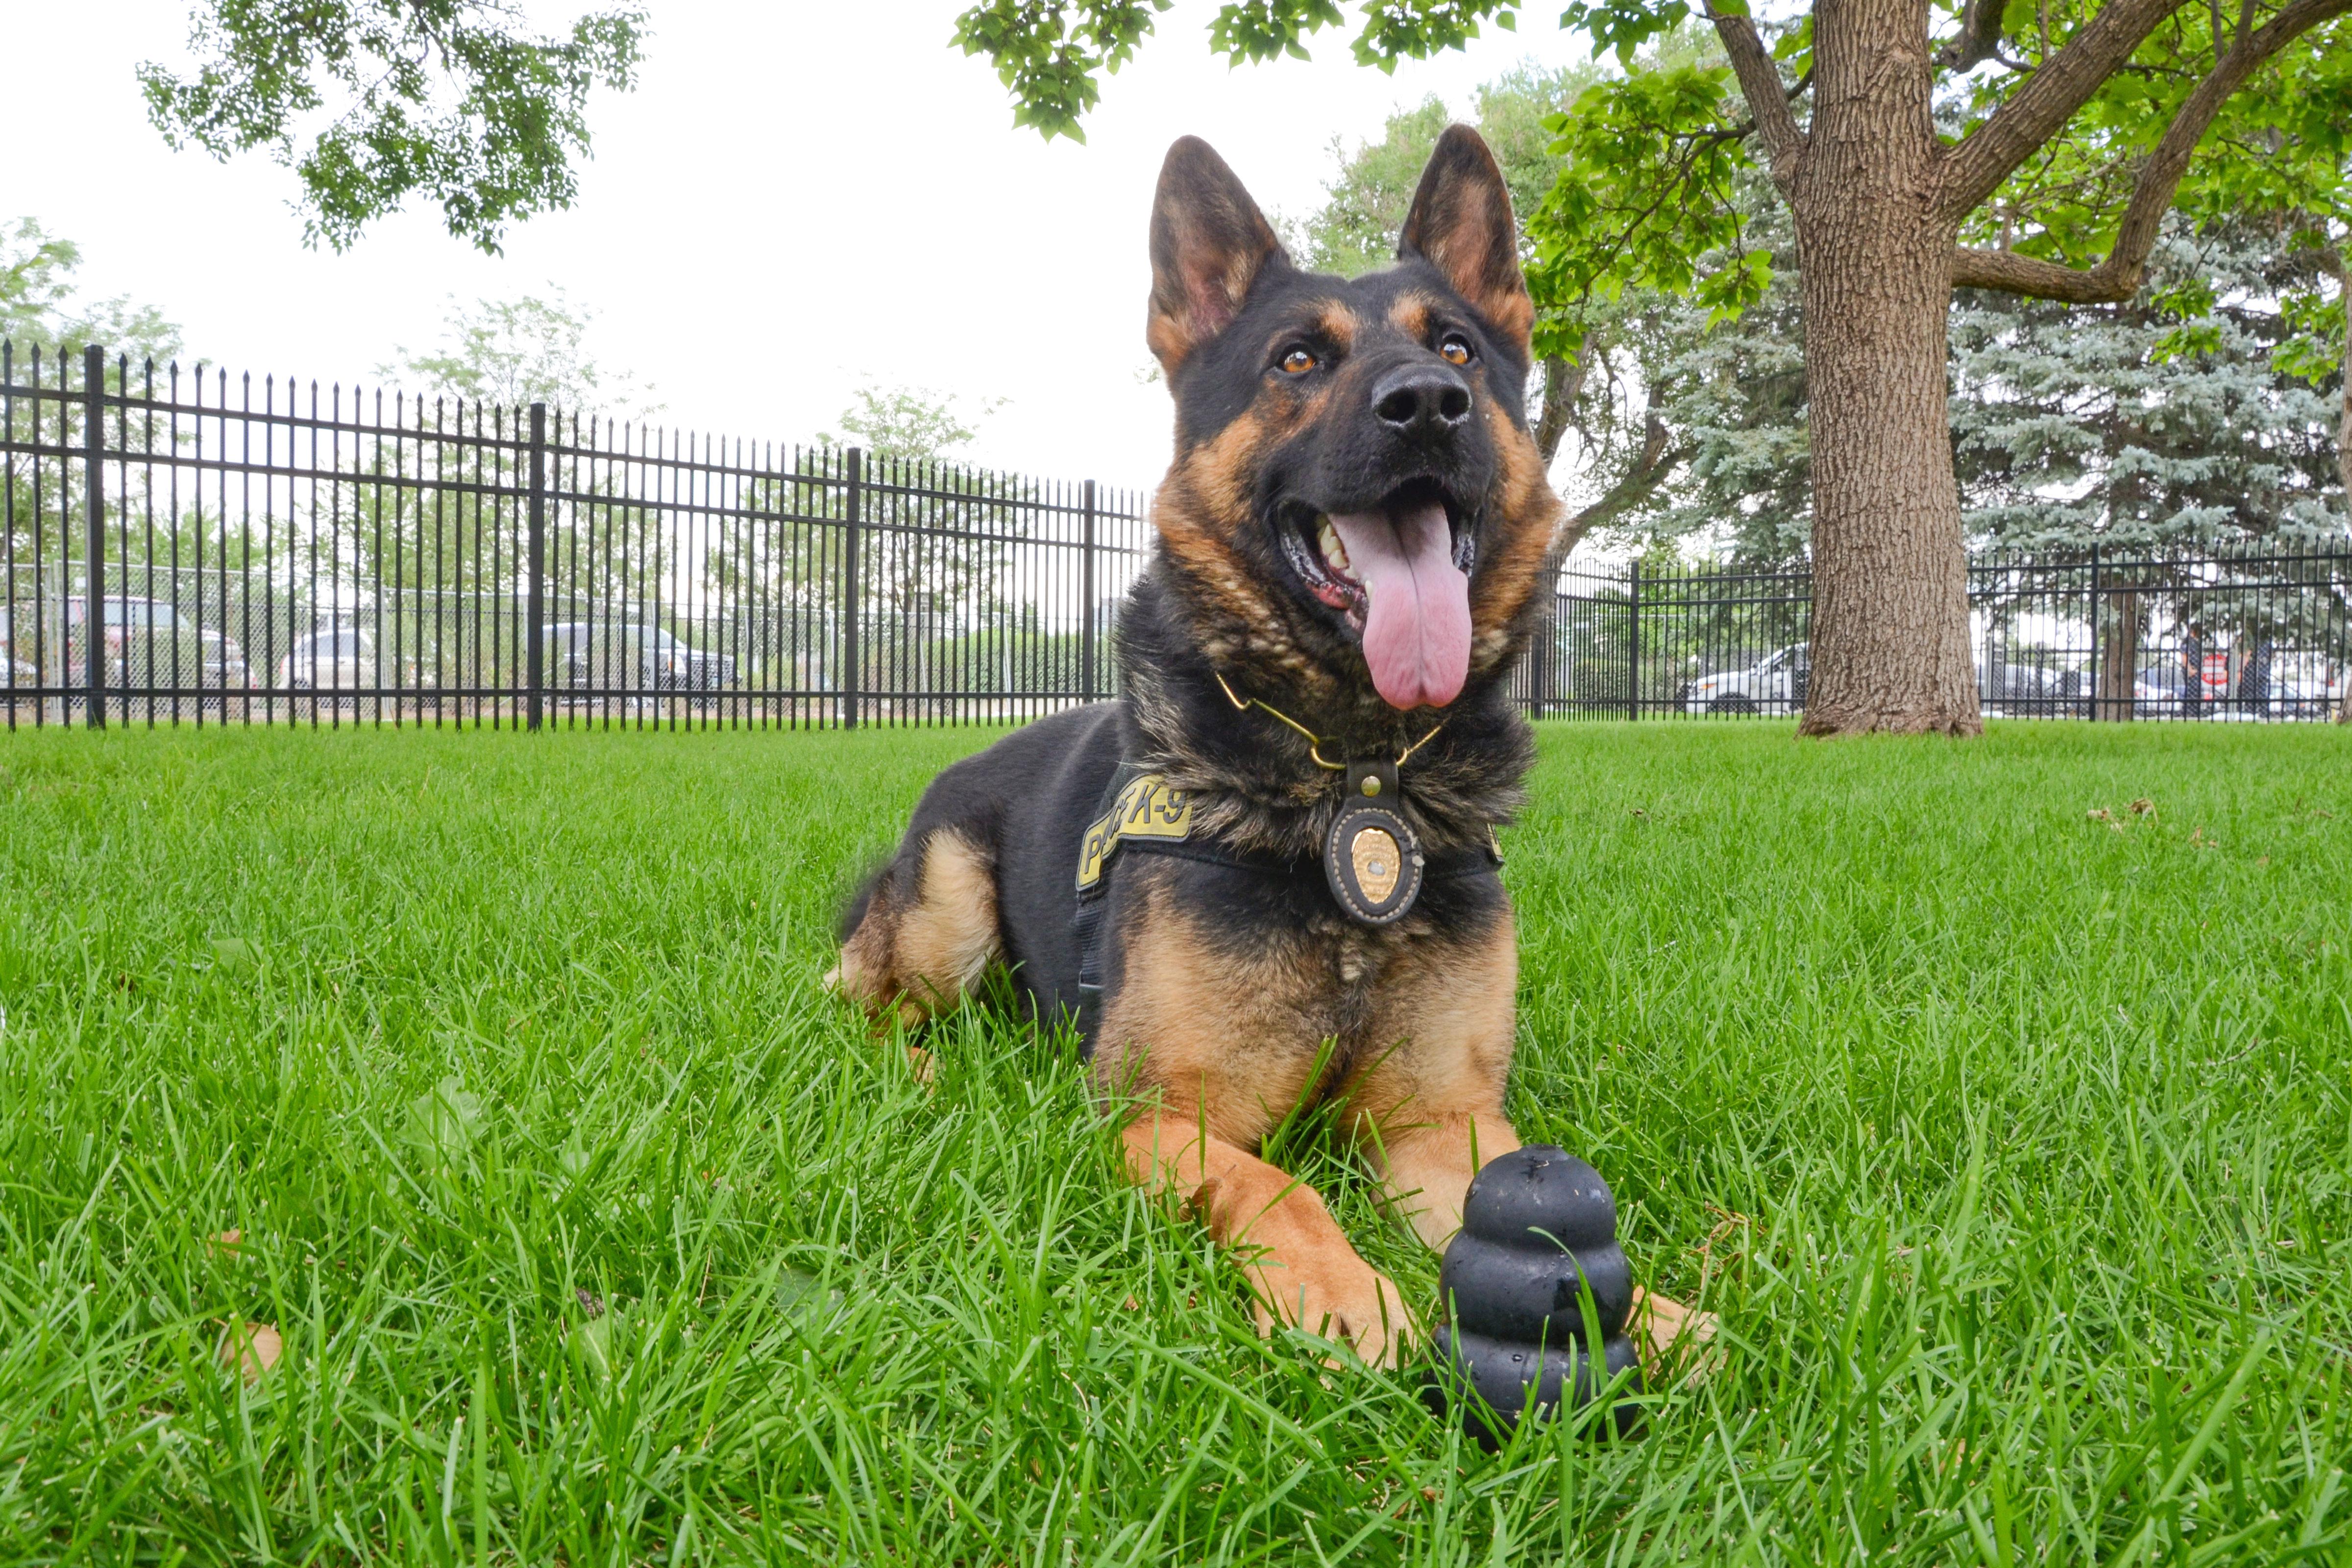 Photo: Pot-Sniffing Dogs 1 | Aurora PD Dog Deuce - SBrasch